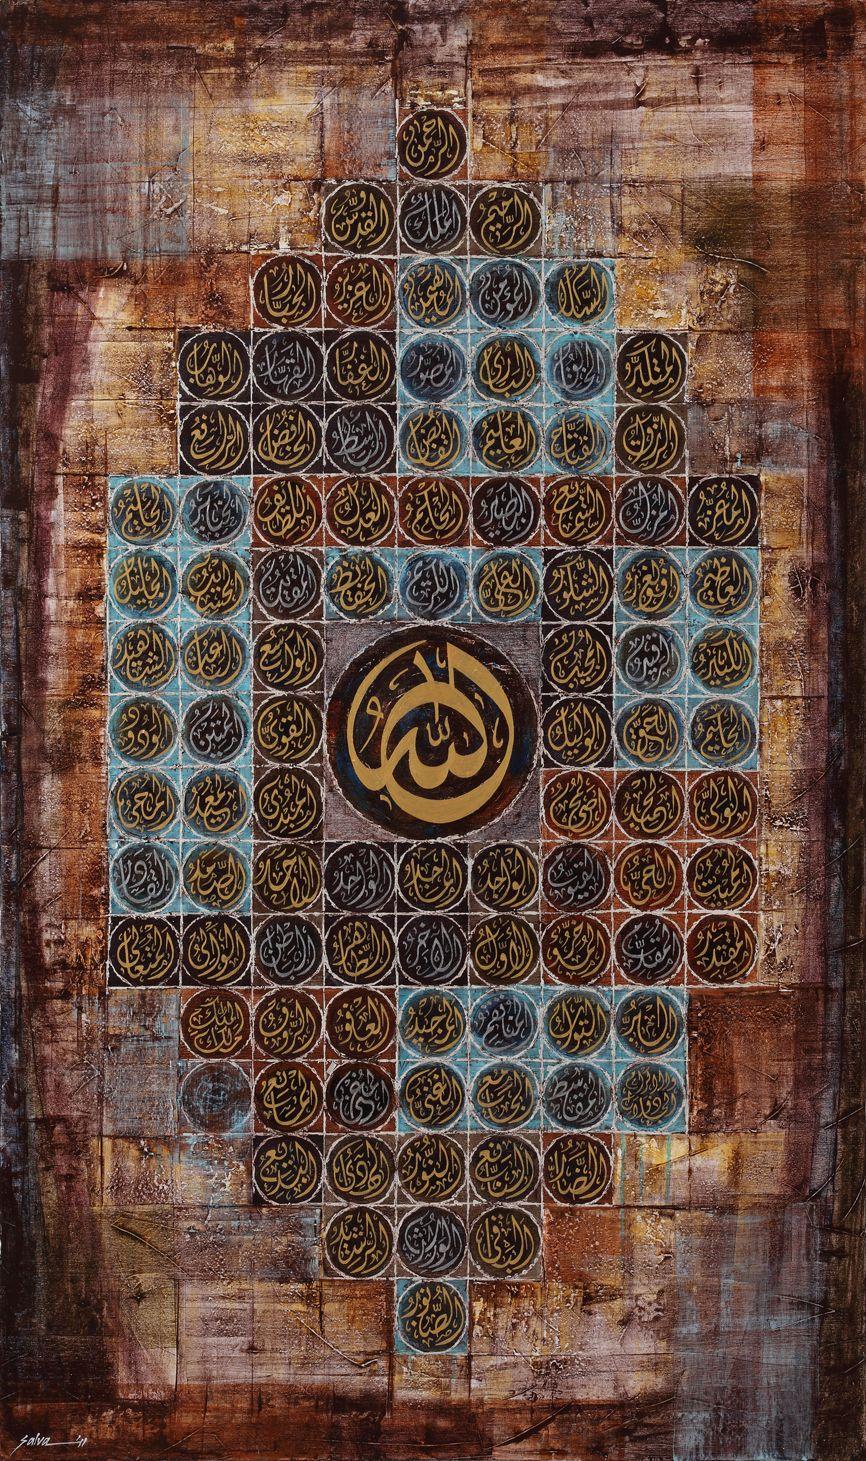 Contemporary Arabic Calligraphy Art portfoliobox Asma ul